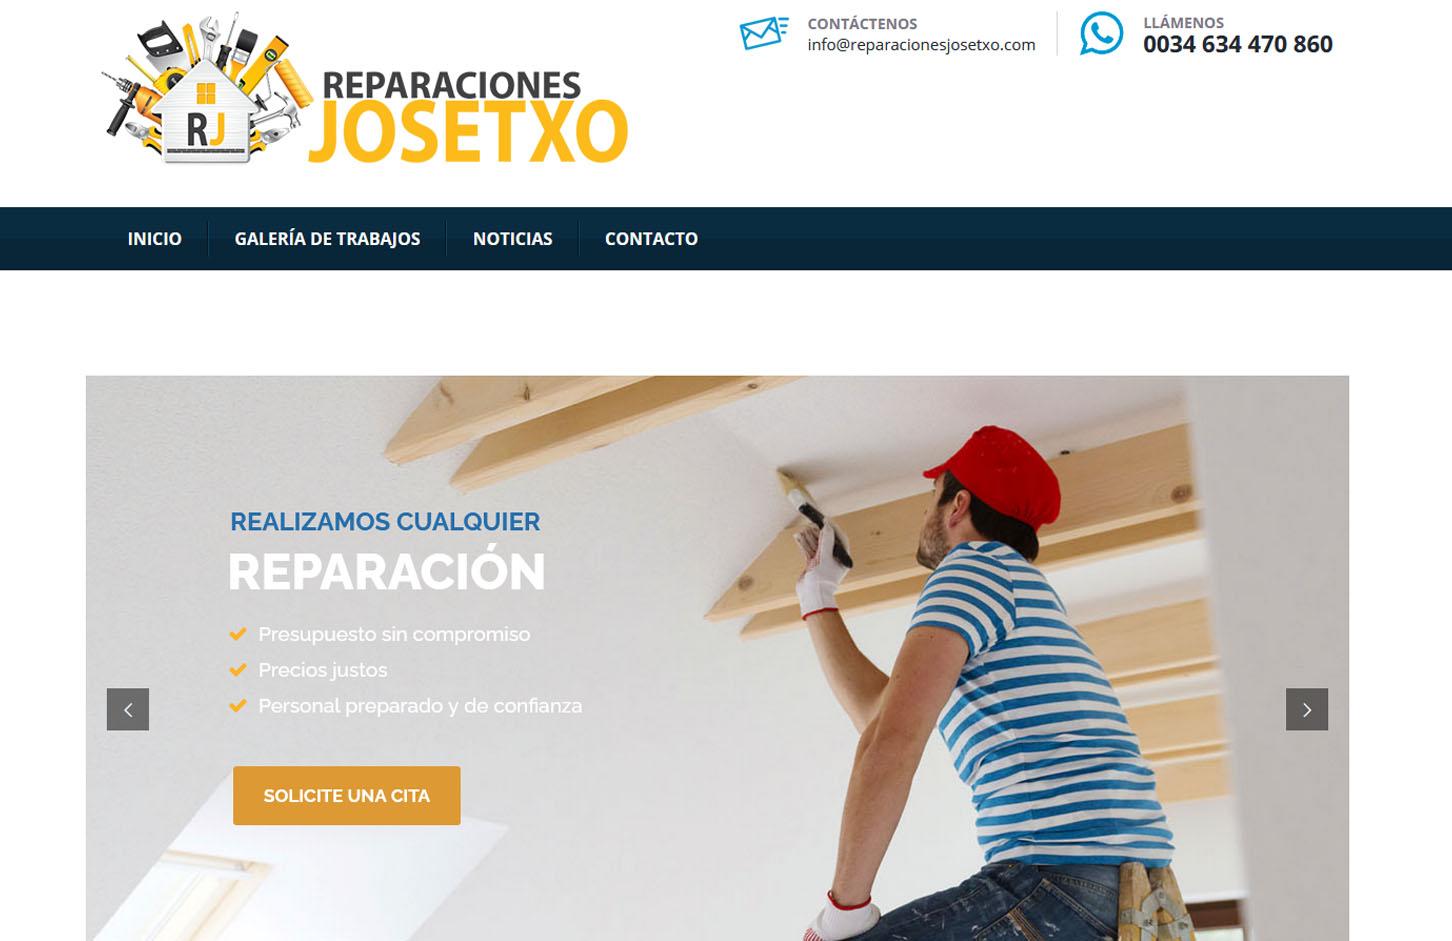 Reparaciones Josetxo